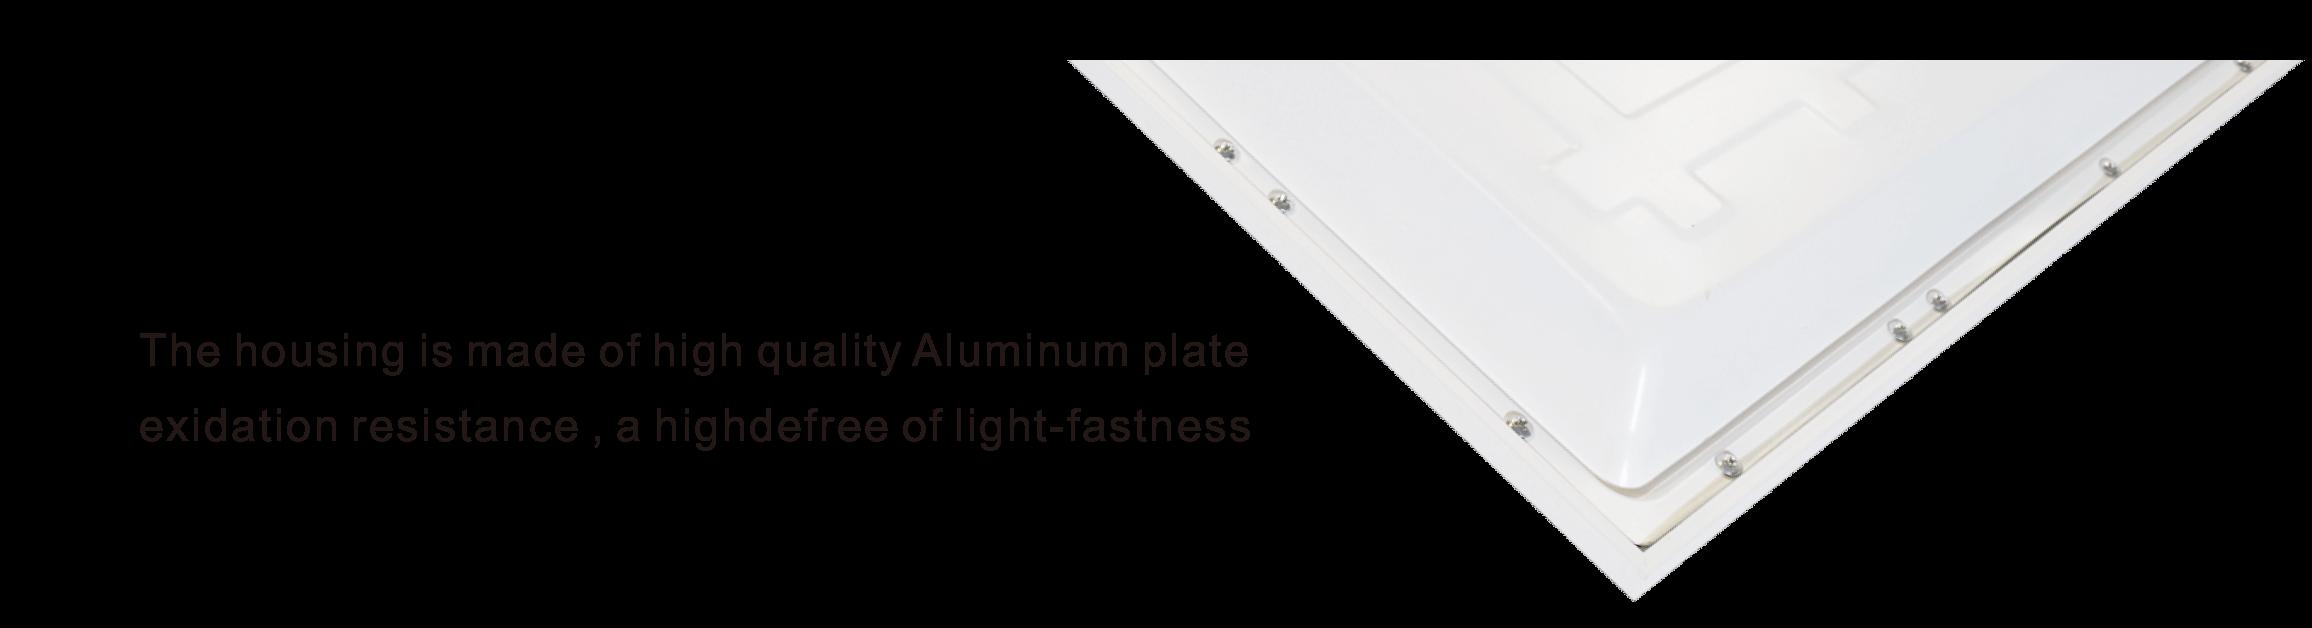 smart lighting control 2x2 2x4 1x4 high quality led ceiling lights panels